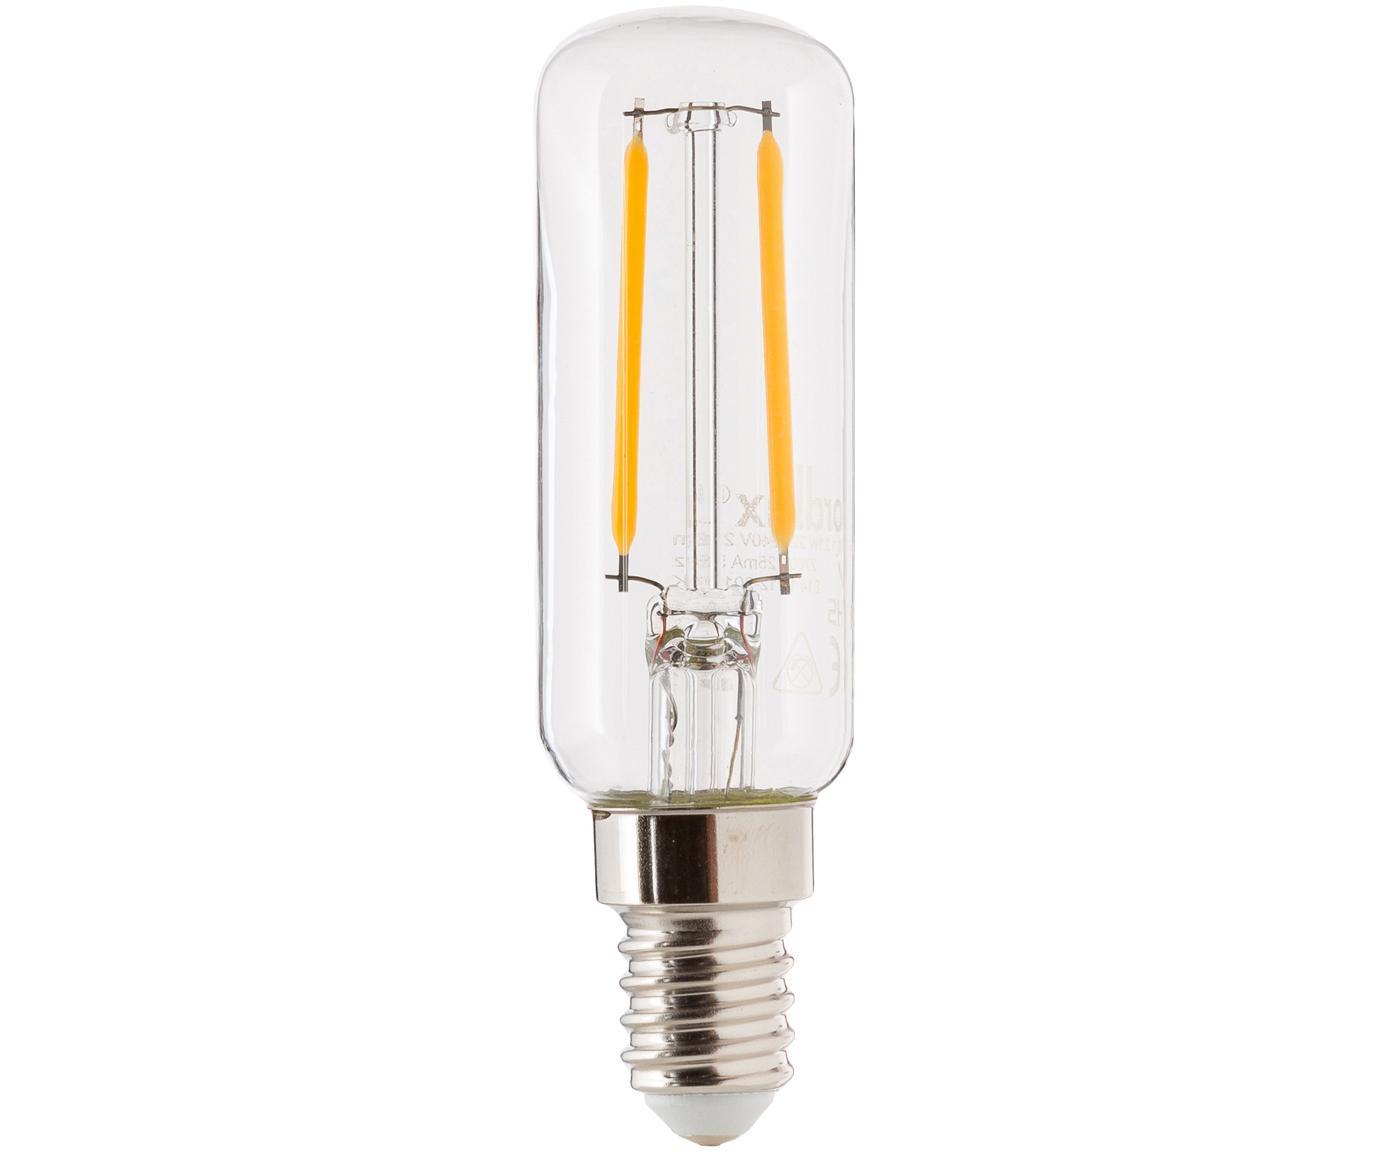 LED Leuchtmittel Yura (E14/2W), Leuchtmittelschirm: Glas, Leuchtmittelfassung: Aluminium, Transparent, Ø 3 x H 9 cm